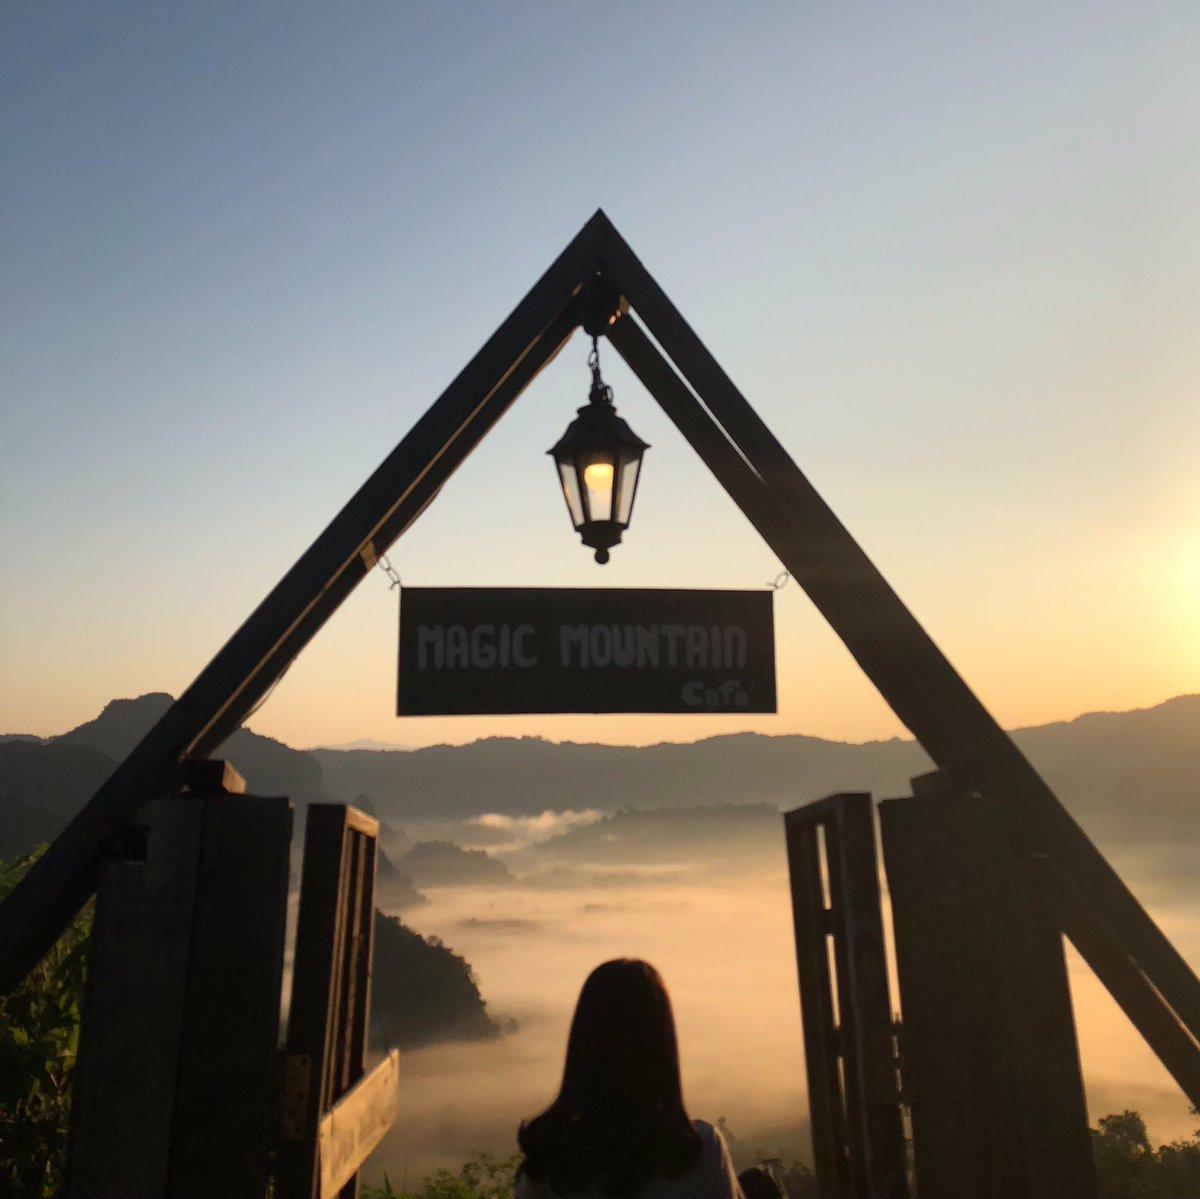 Magic mountain cafe&#39;  #ReviewThailand #magicmountaincafe #รีวิวพะเยา #ภูลังกา #รีวิวภูลังกา<br>http://pic.twitter.com/b6M21lzrr2